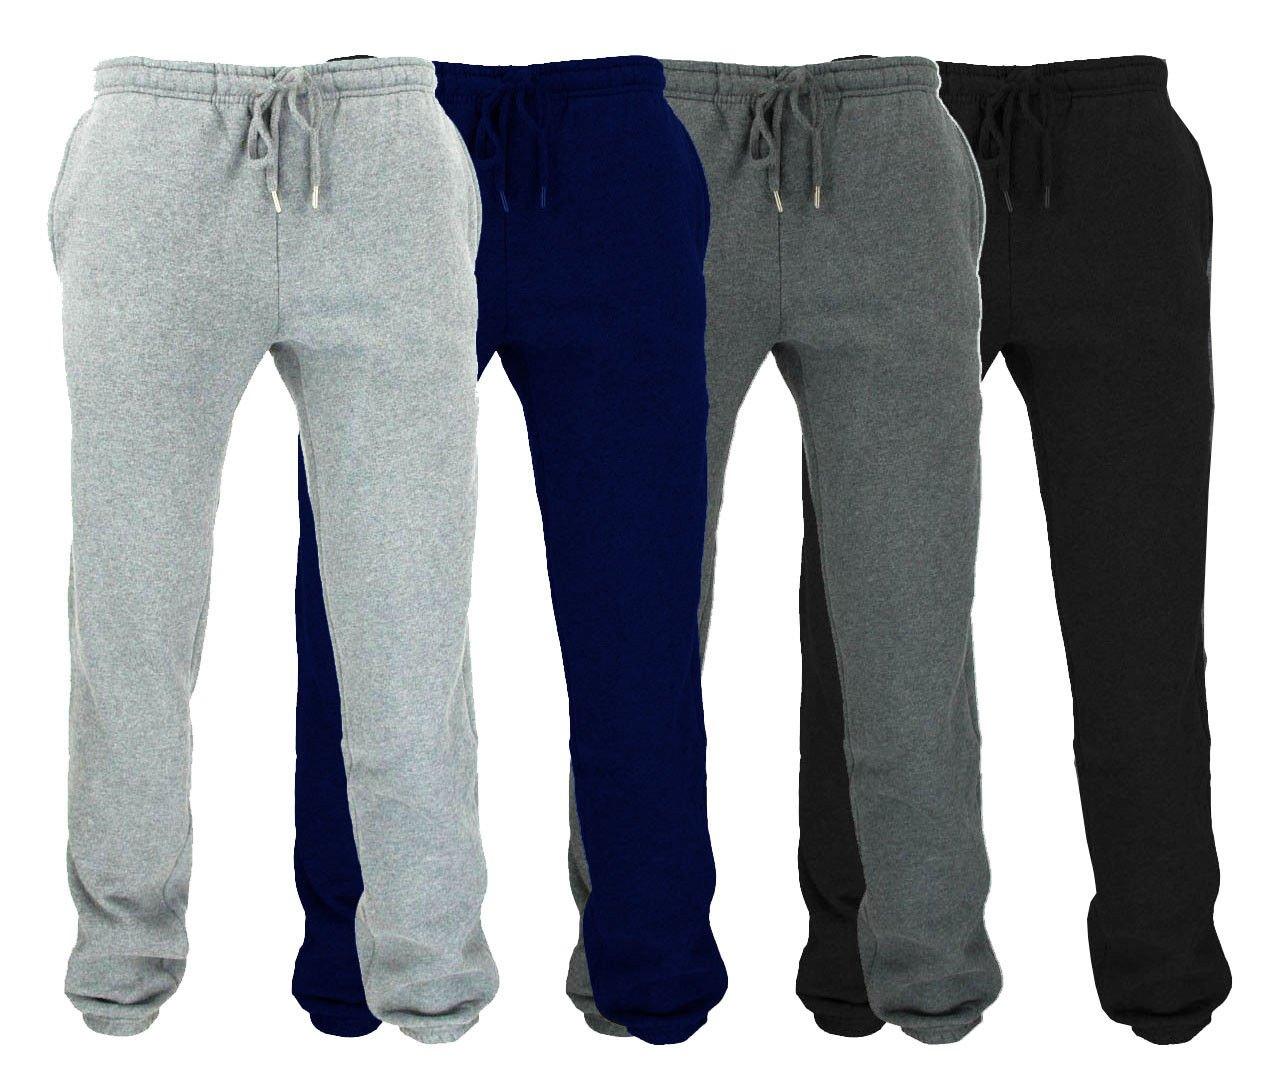 Wear The Gear Boys Kids Bottoms Joggers Jog Pants Tracksuit Jog Bottom Fleece 3 Zip Pockets 5yrs-14yrs